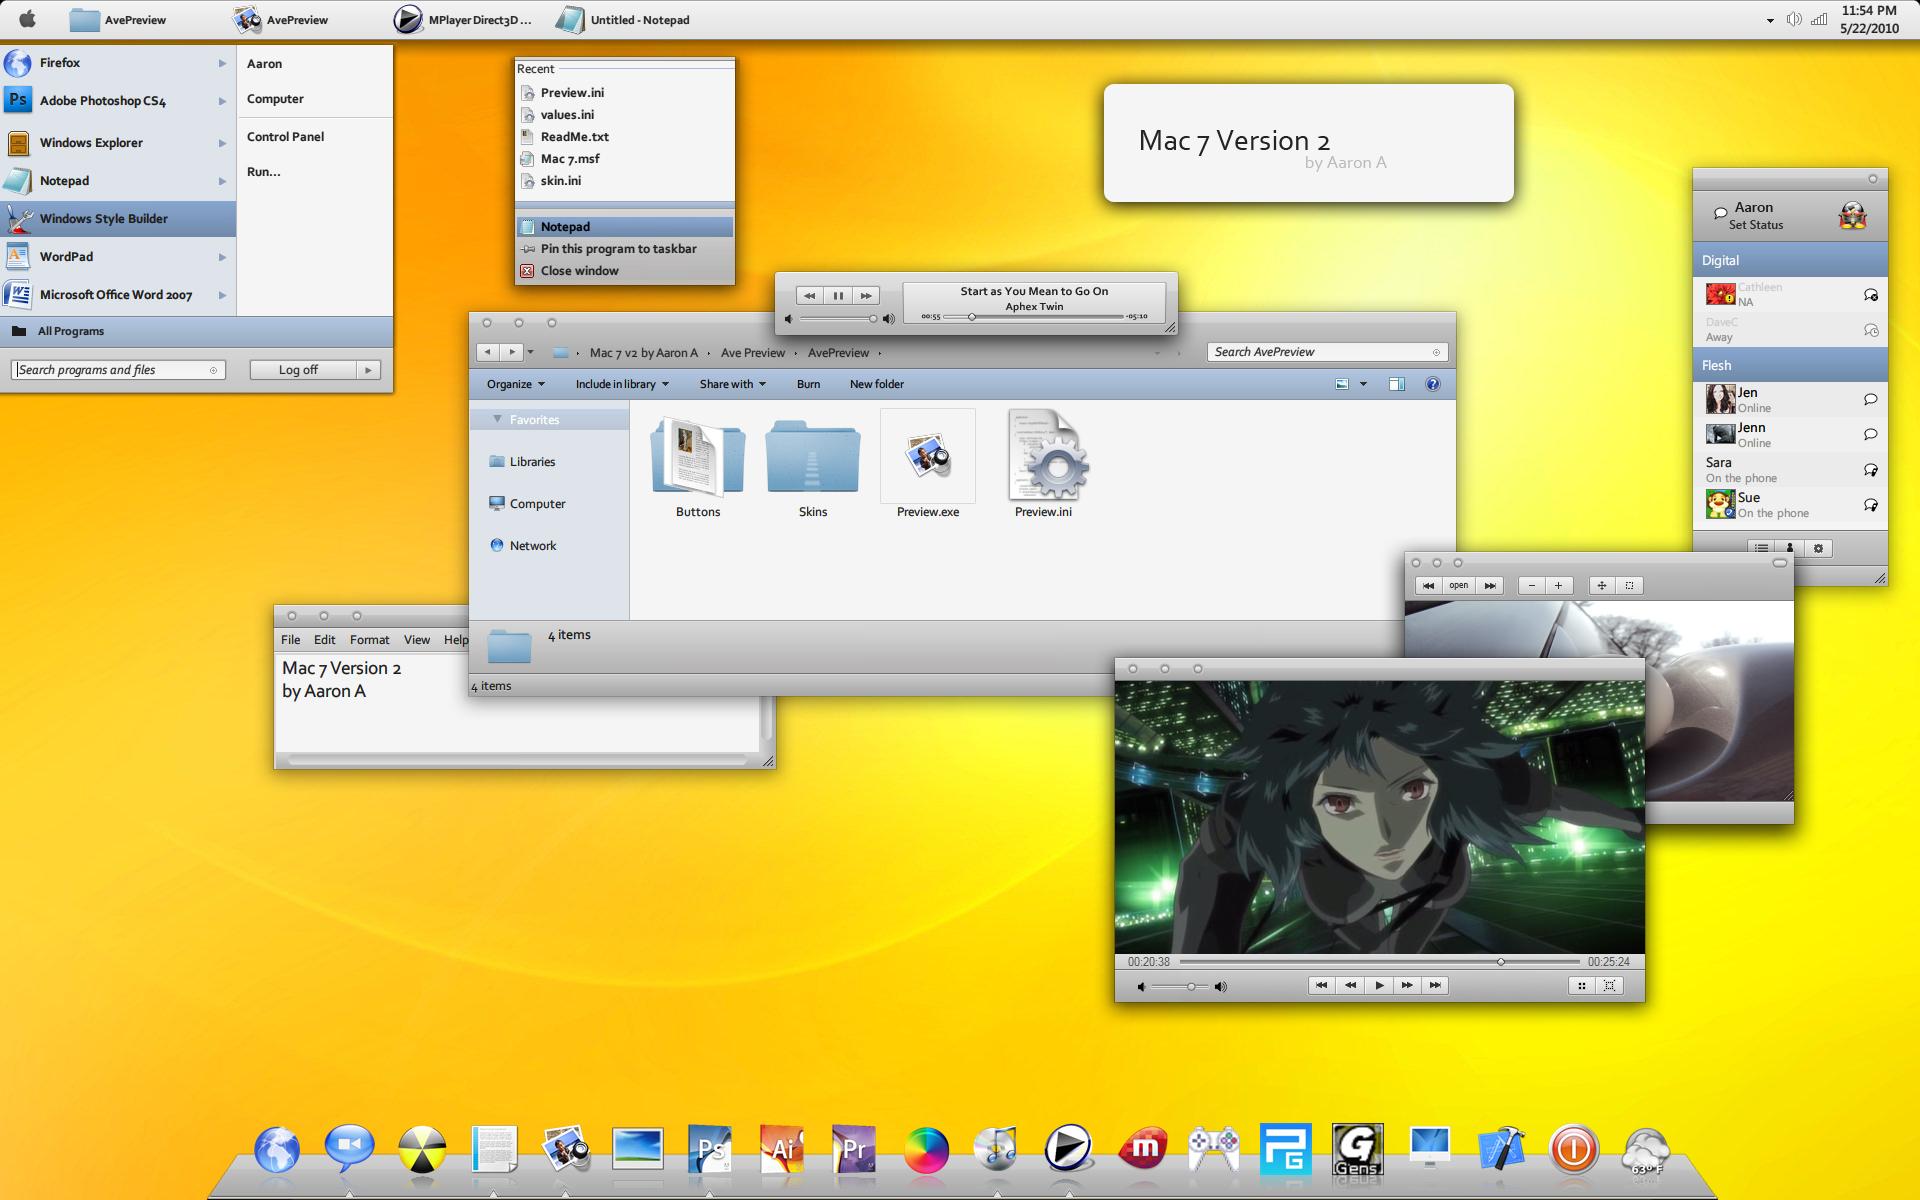 Mac 7 Version 2